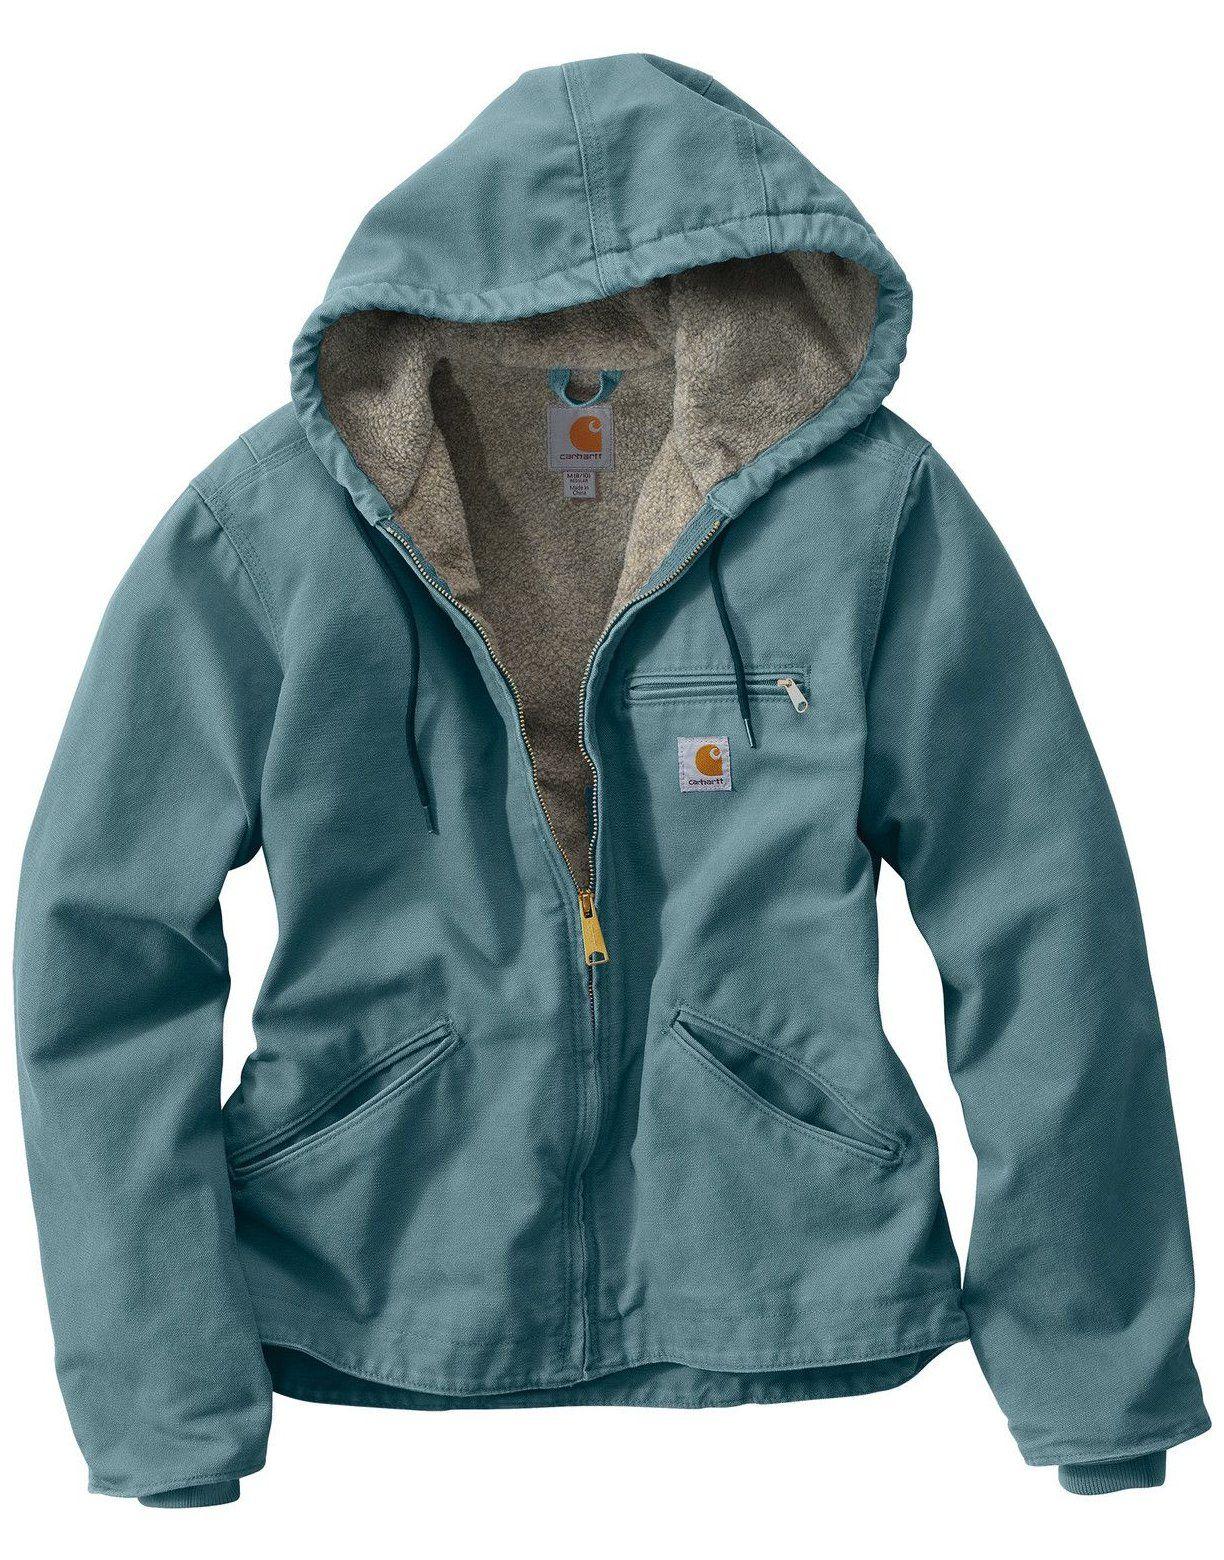 Carhartt Women S Sandstone Sierra Sherpa Lined Jacket Carhartt Women Outfits Jackets 2020 Kadin Paltolari Mont Kadin Kiyafetleri [ 1560 x 1224 Pixel ]